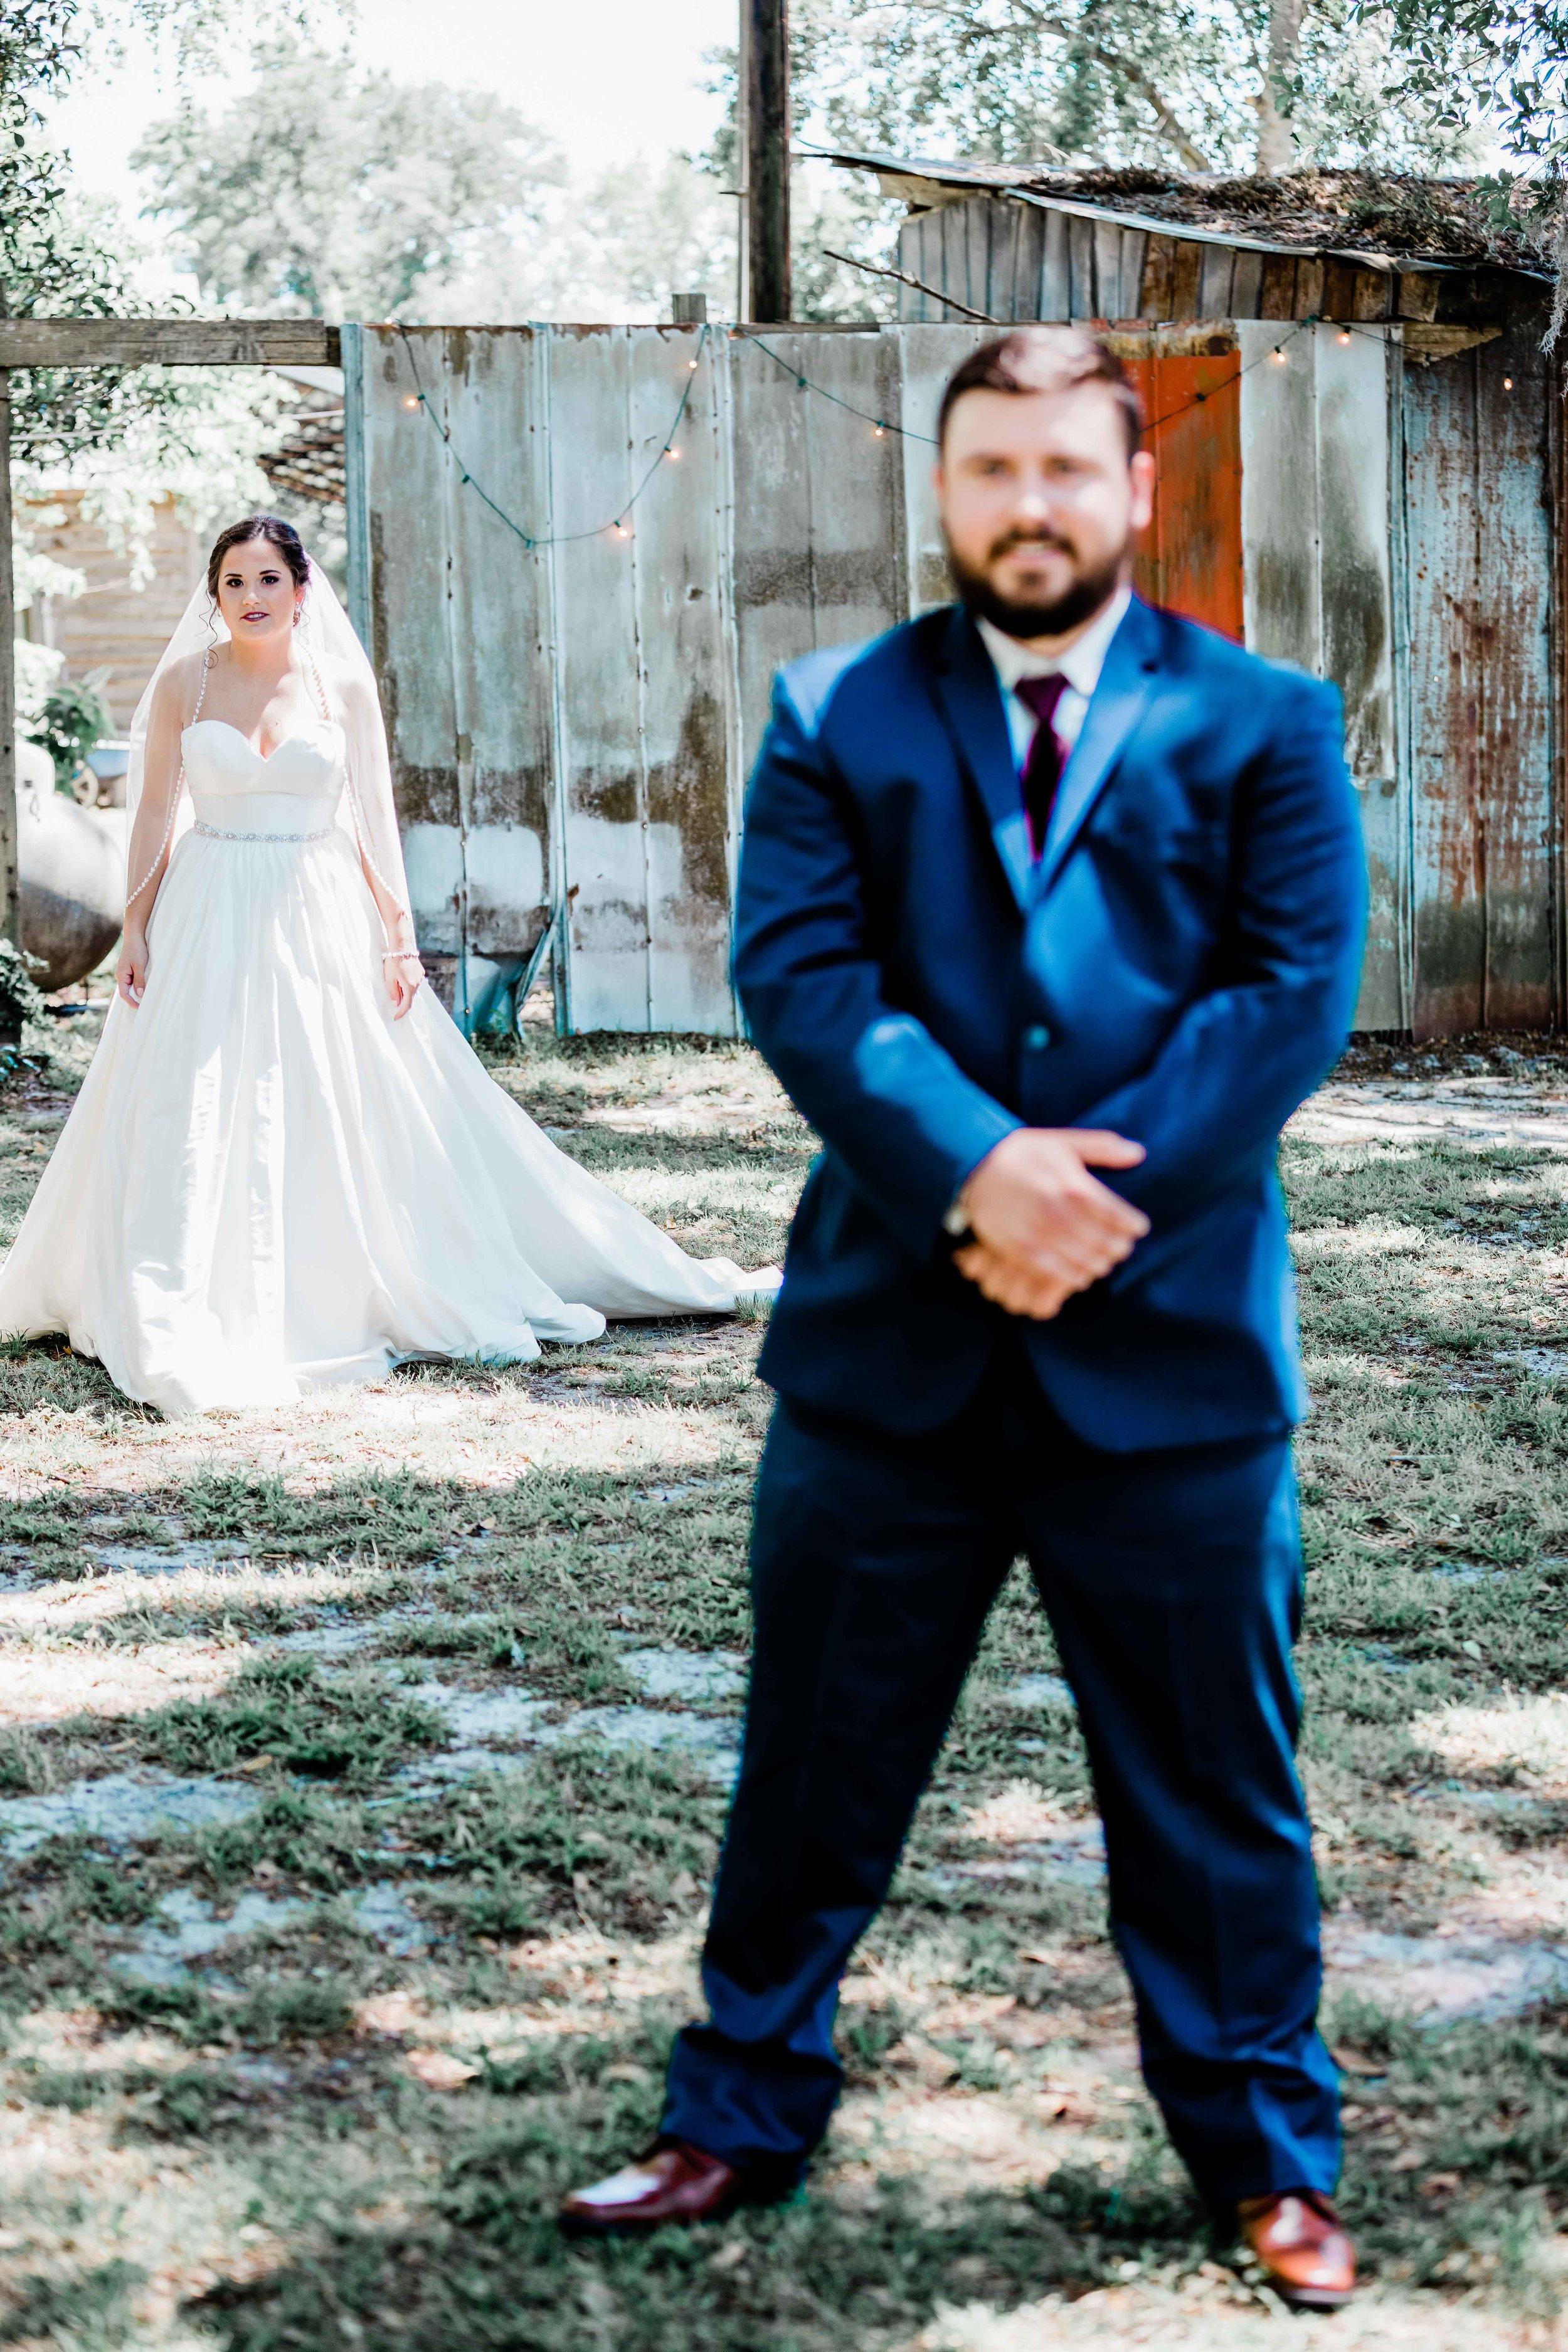 20190427-Southern Lens Photography- Savannah Wedding Photographer-Screven and Caroline-201930.jpg